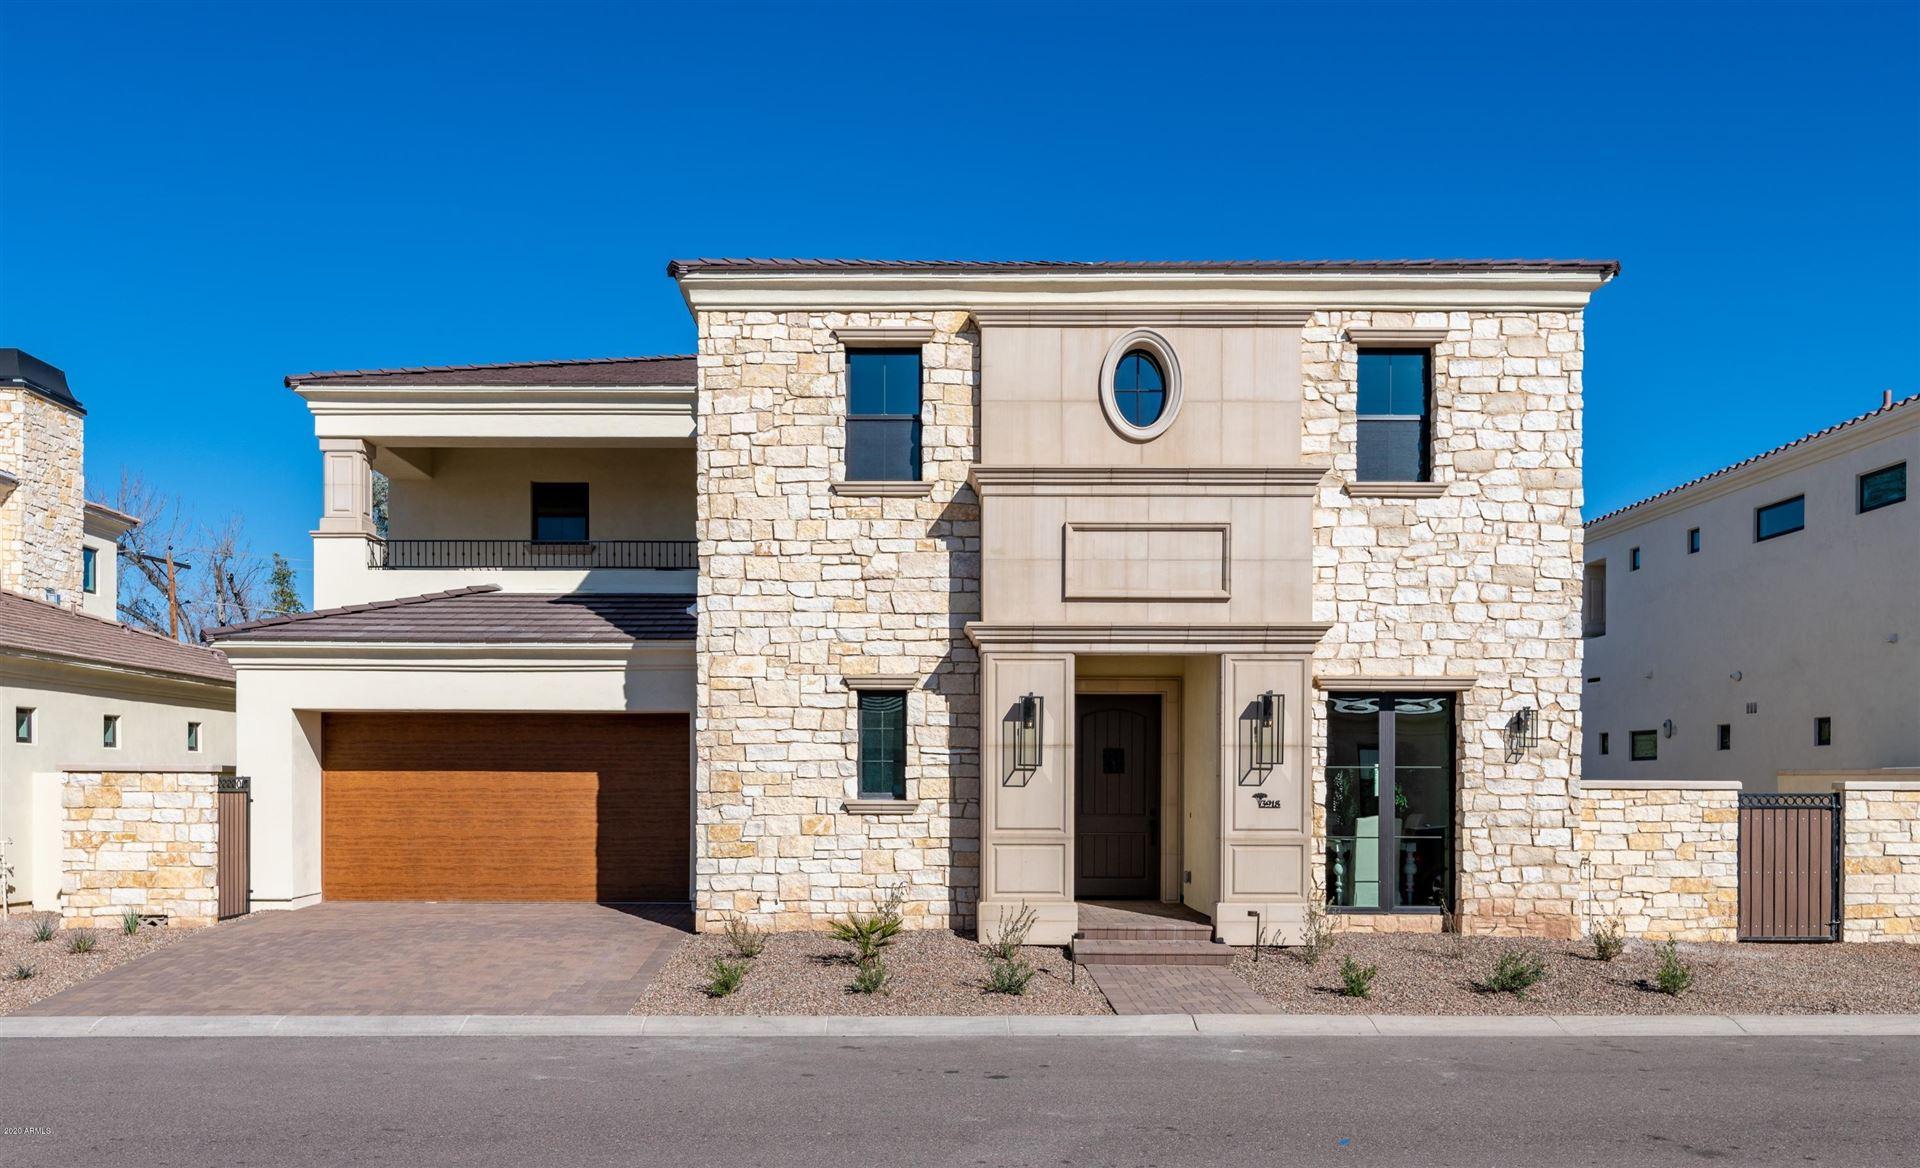 3918 E CRITTENDEN Lane, Phoenix, AZ 85018 - MLS#: 6159221